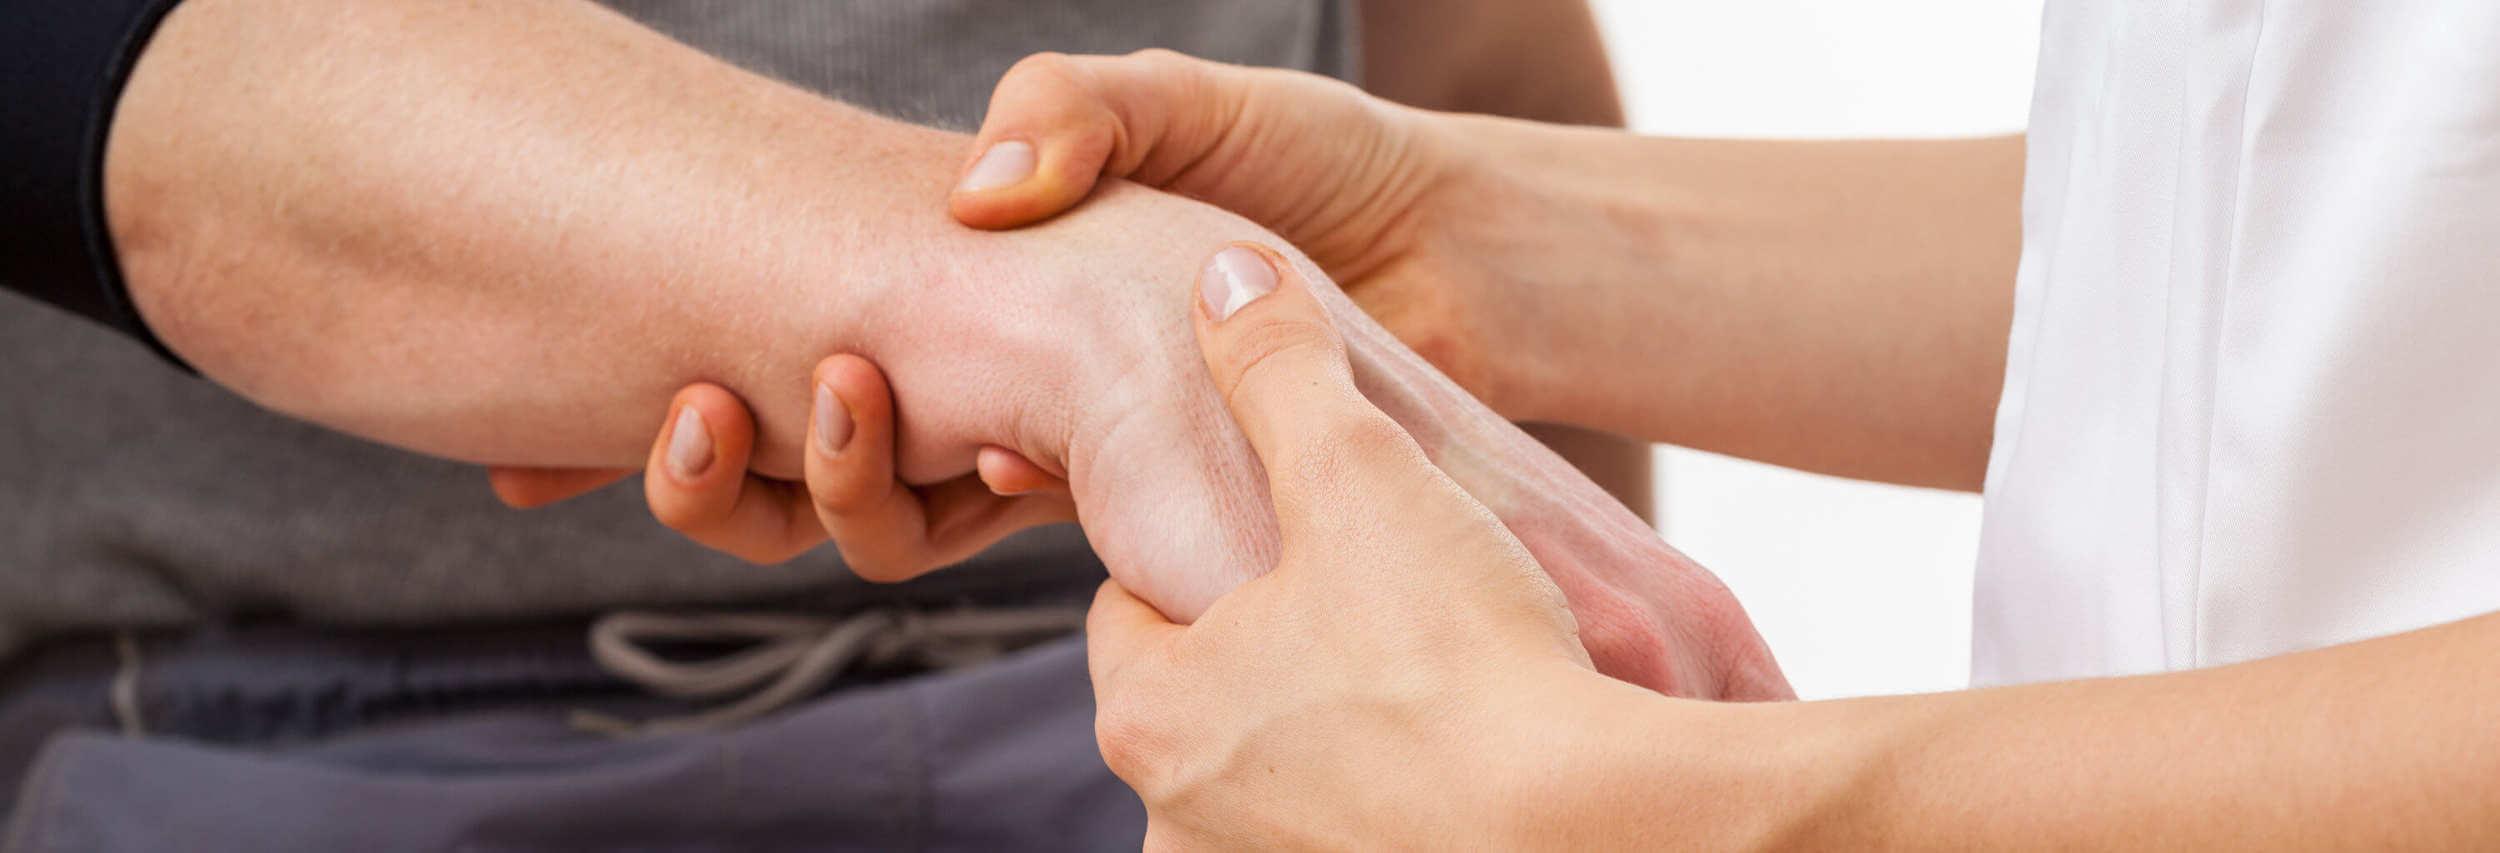 rehabilitacja kontuzji nadgarstka